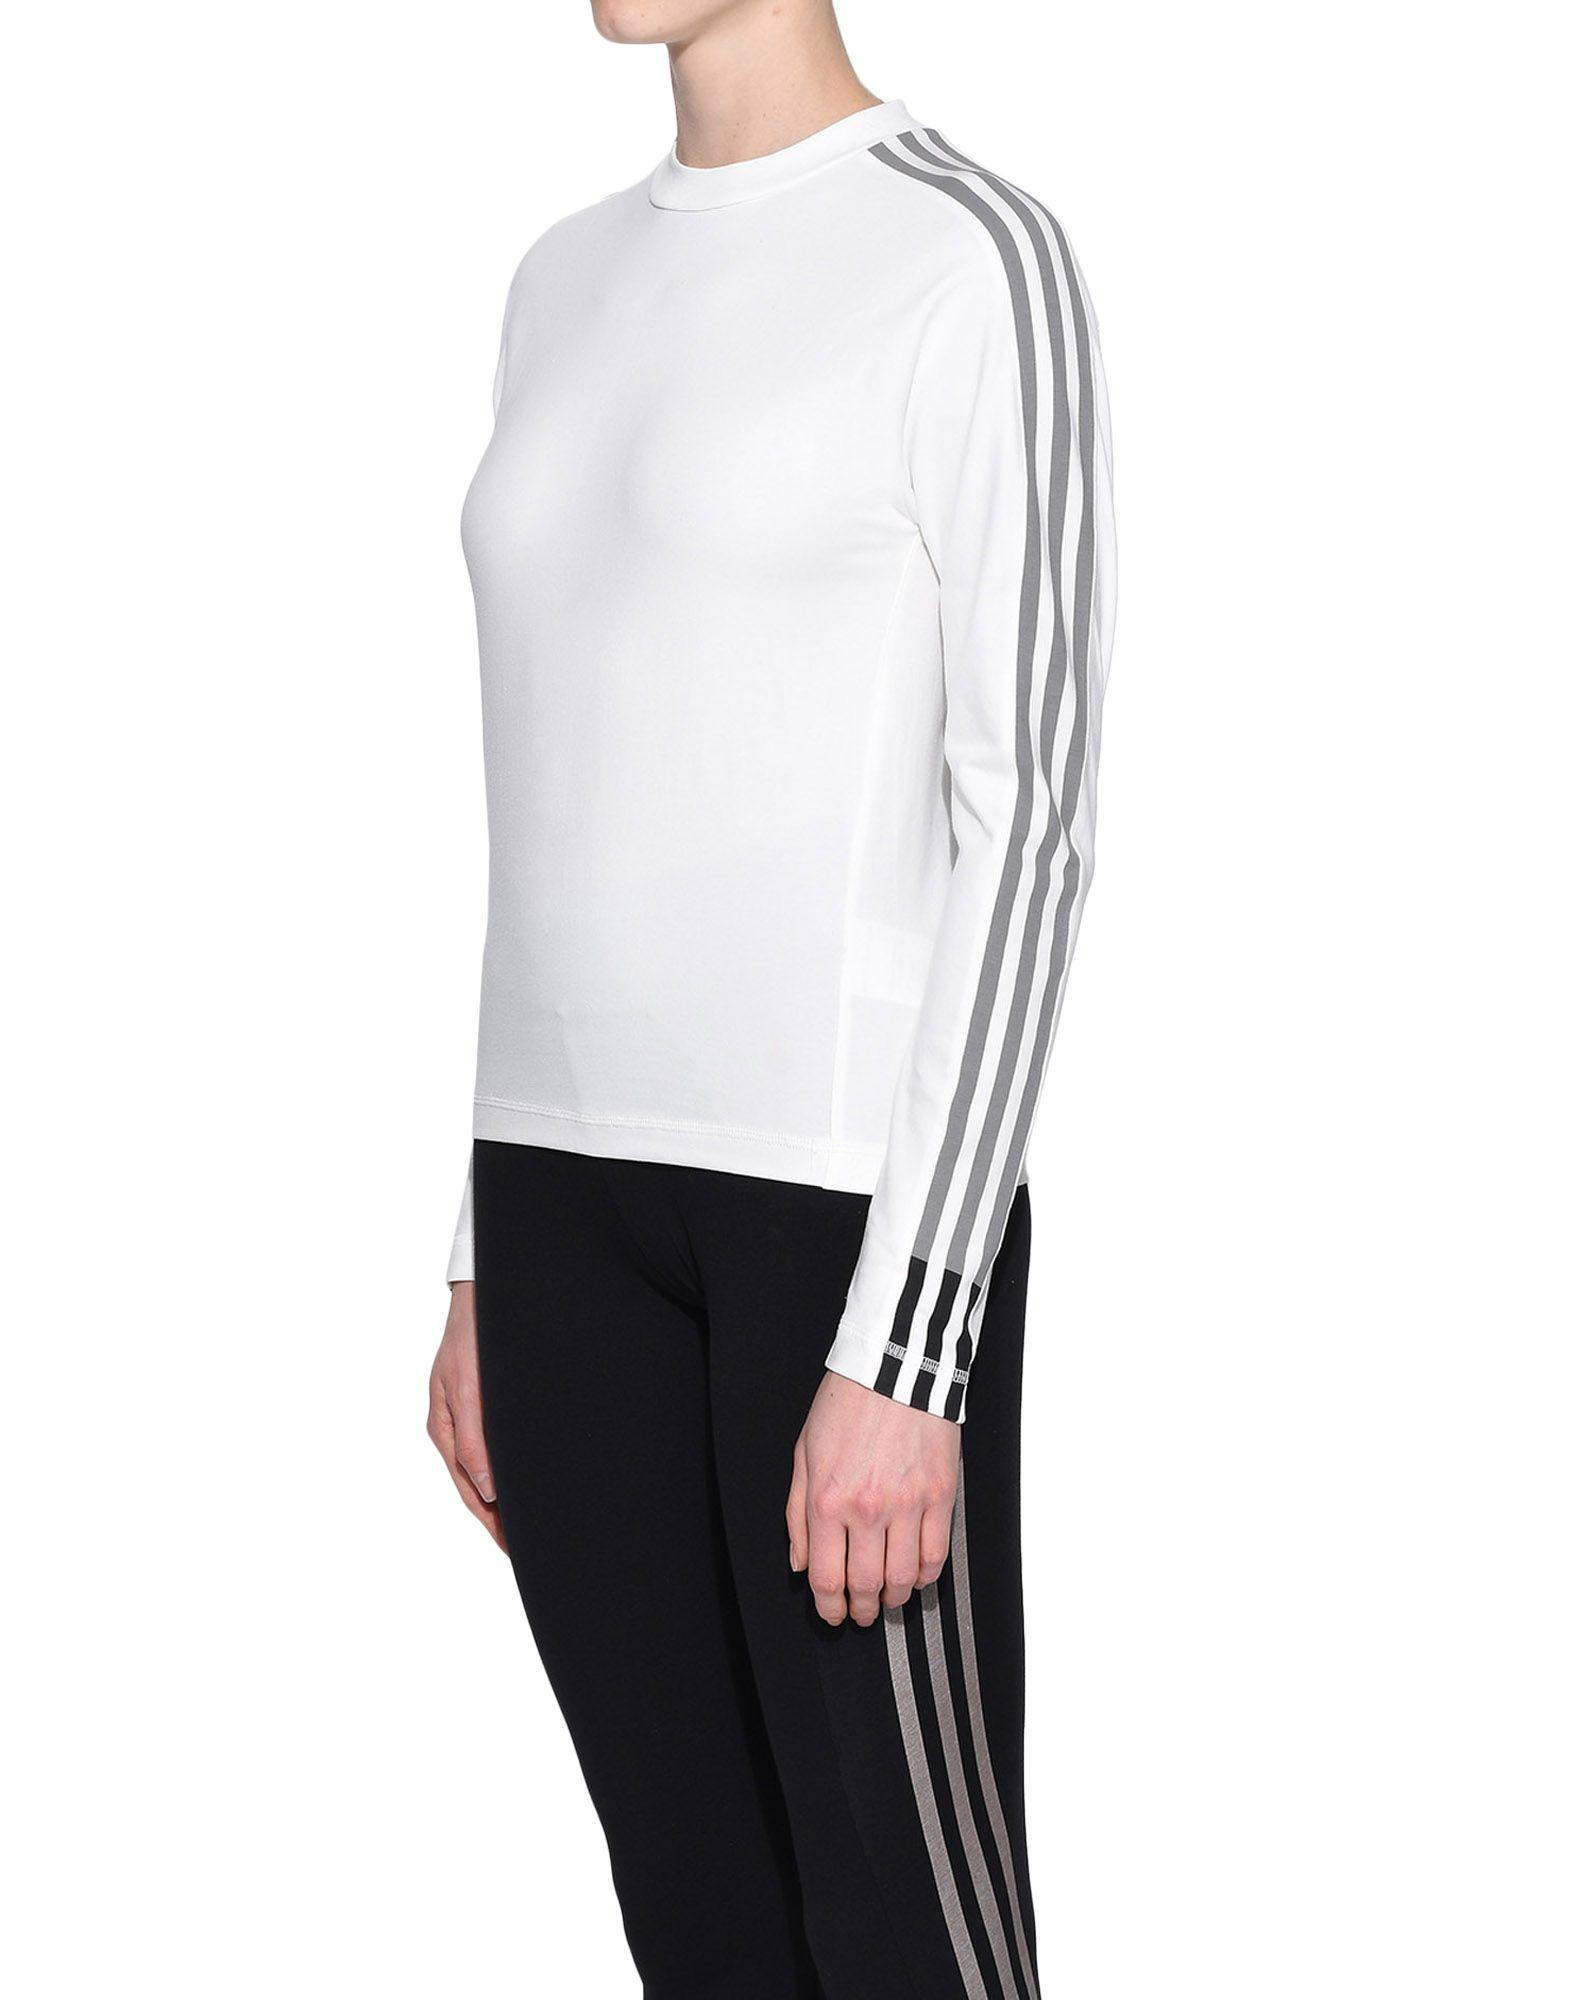 Y-3 Y-3 3-Stripes Tee Long sleeve t-shirt Woman e